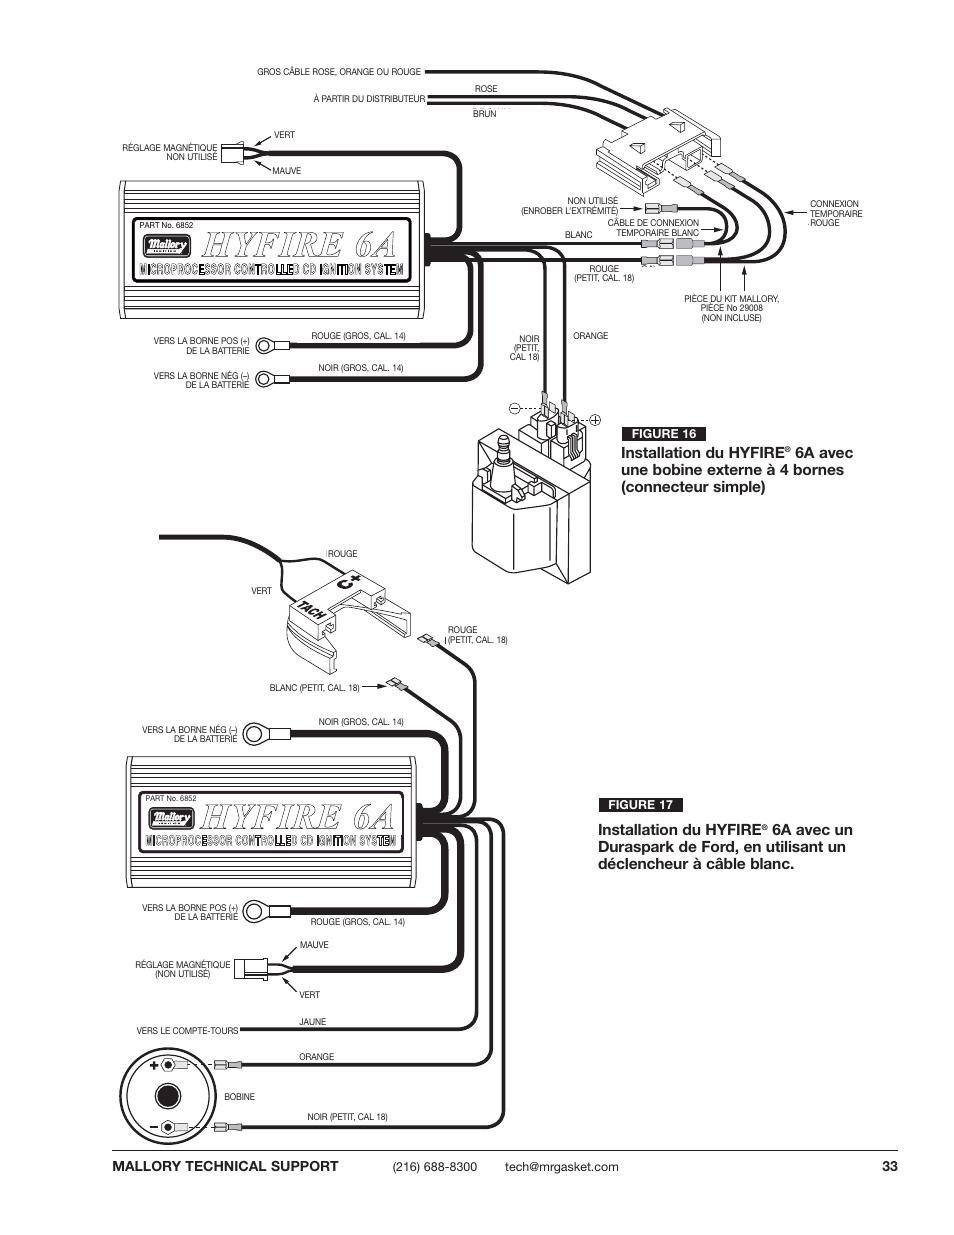 Mallory Ignition Hyfire Wiring Diagram - Auto Wiring Diagram on mallory battery, mallory resistors, mallory gauges, mallory furniture, mallory electronics,